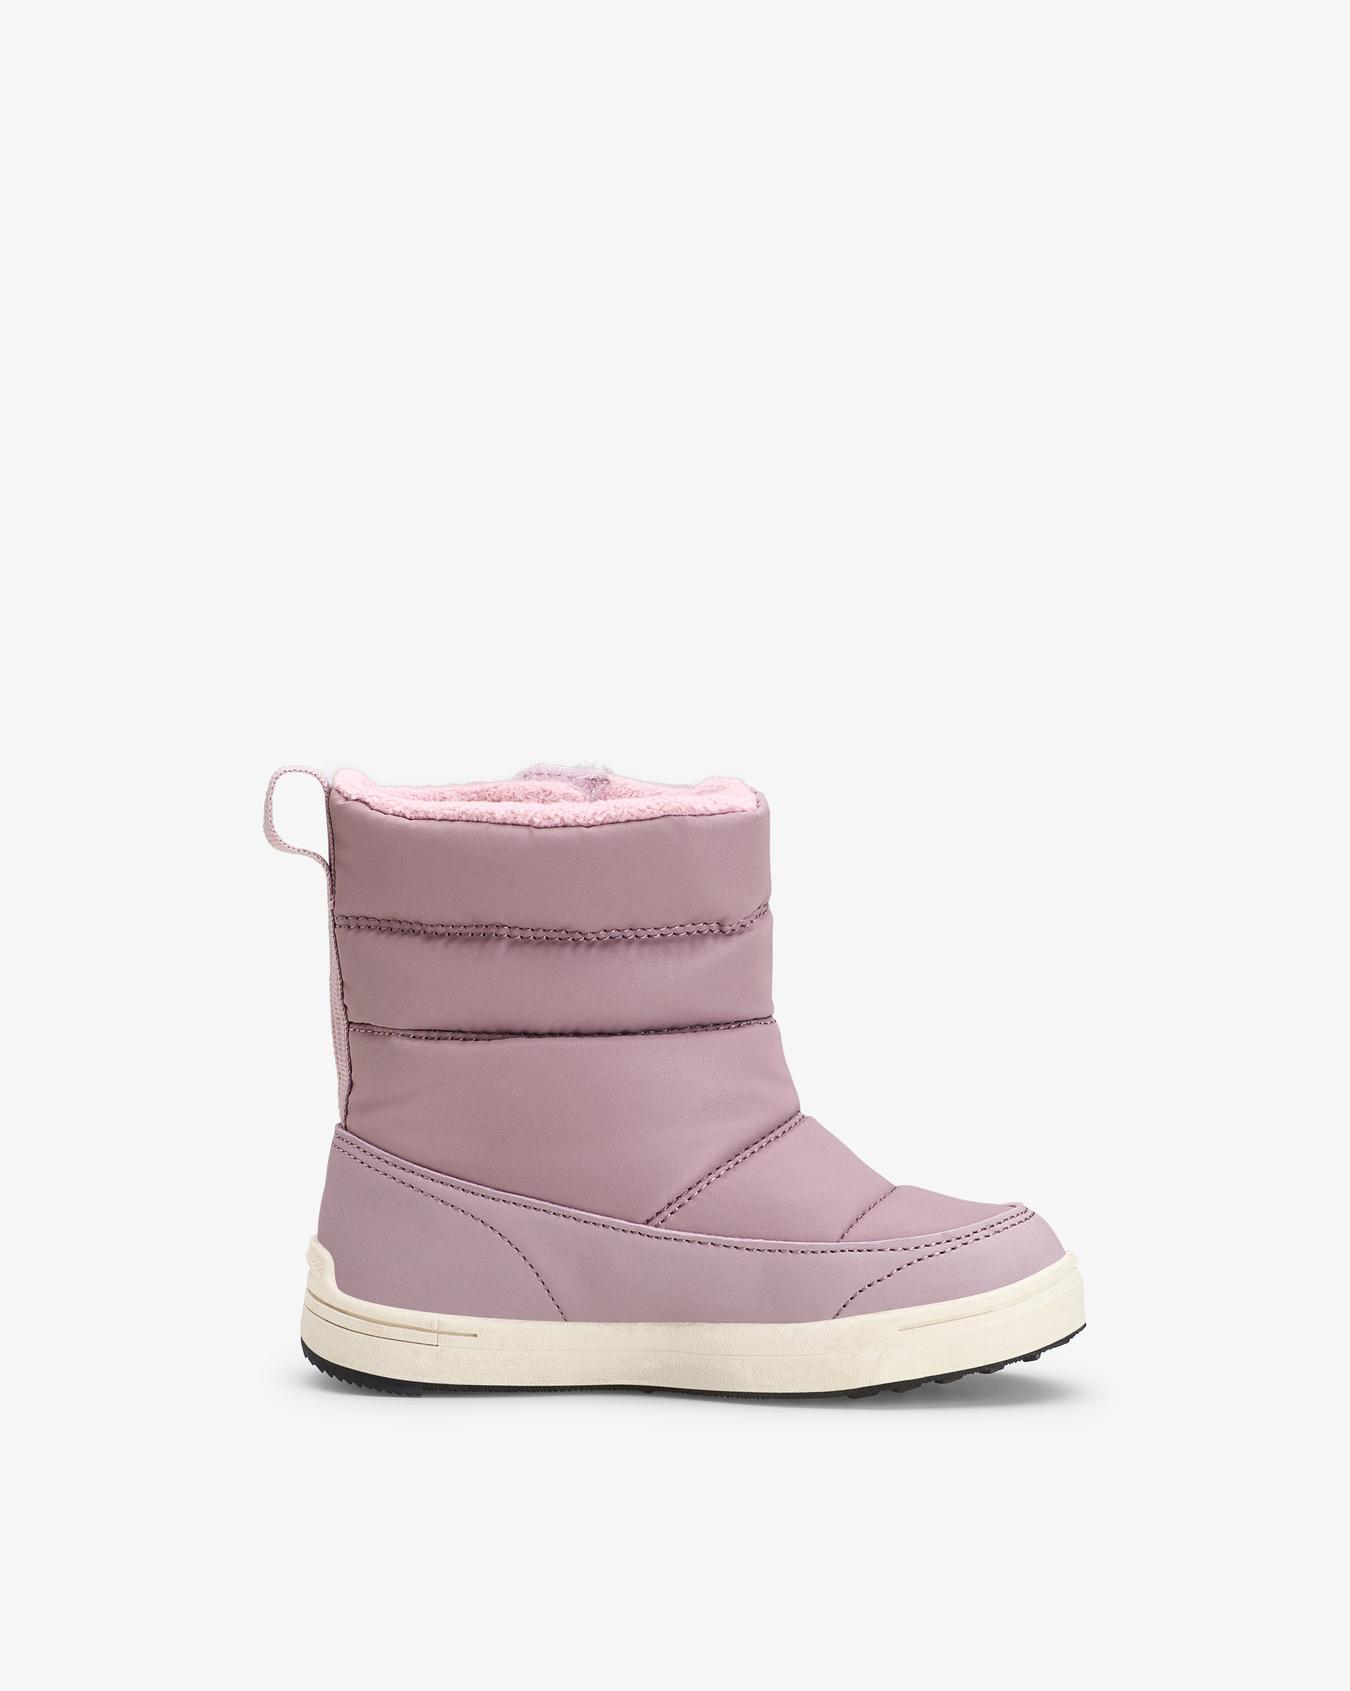 Hoston Dusty Pink Winter Boots